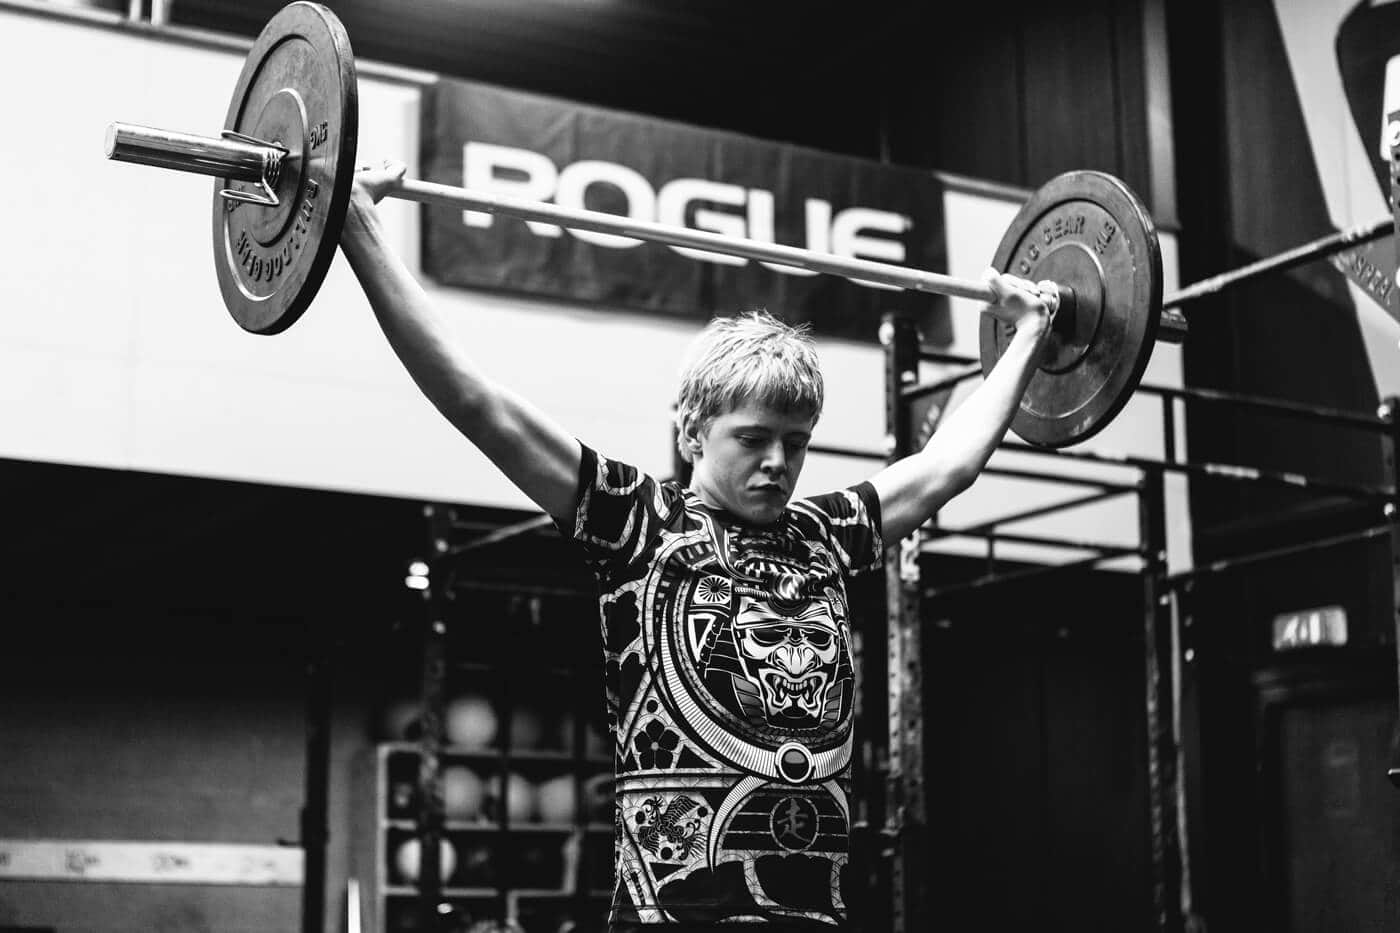 INKnBURN Kleding Product Sport Crossfit Zwart Wit Fotografie Portret